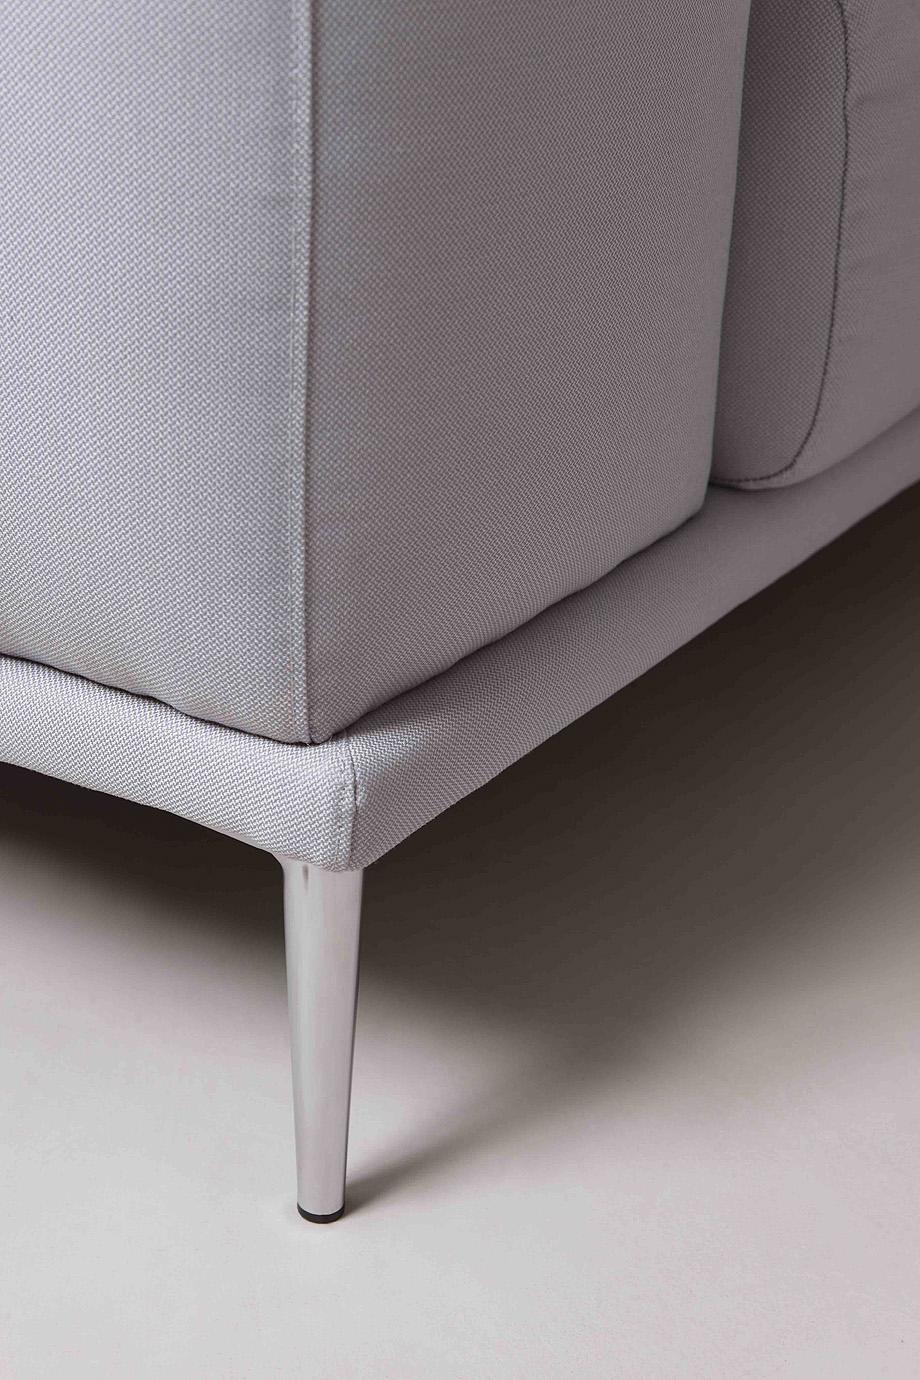 sofa odil de lebom (3)